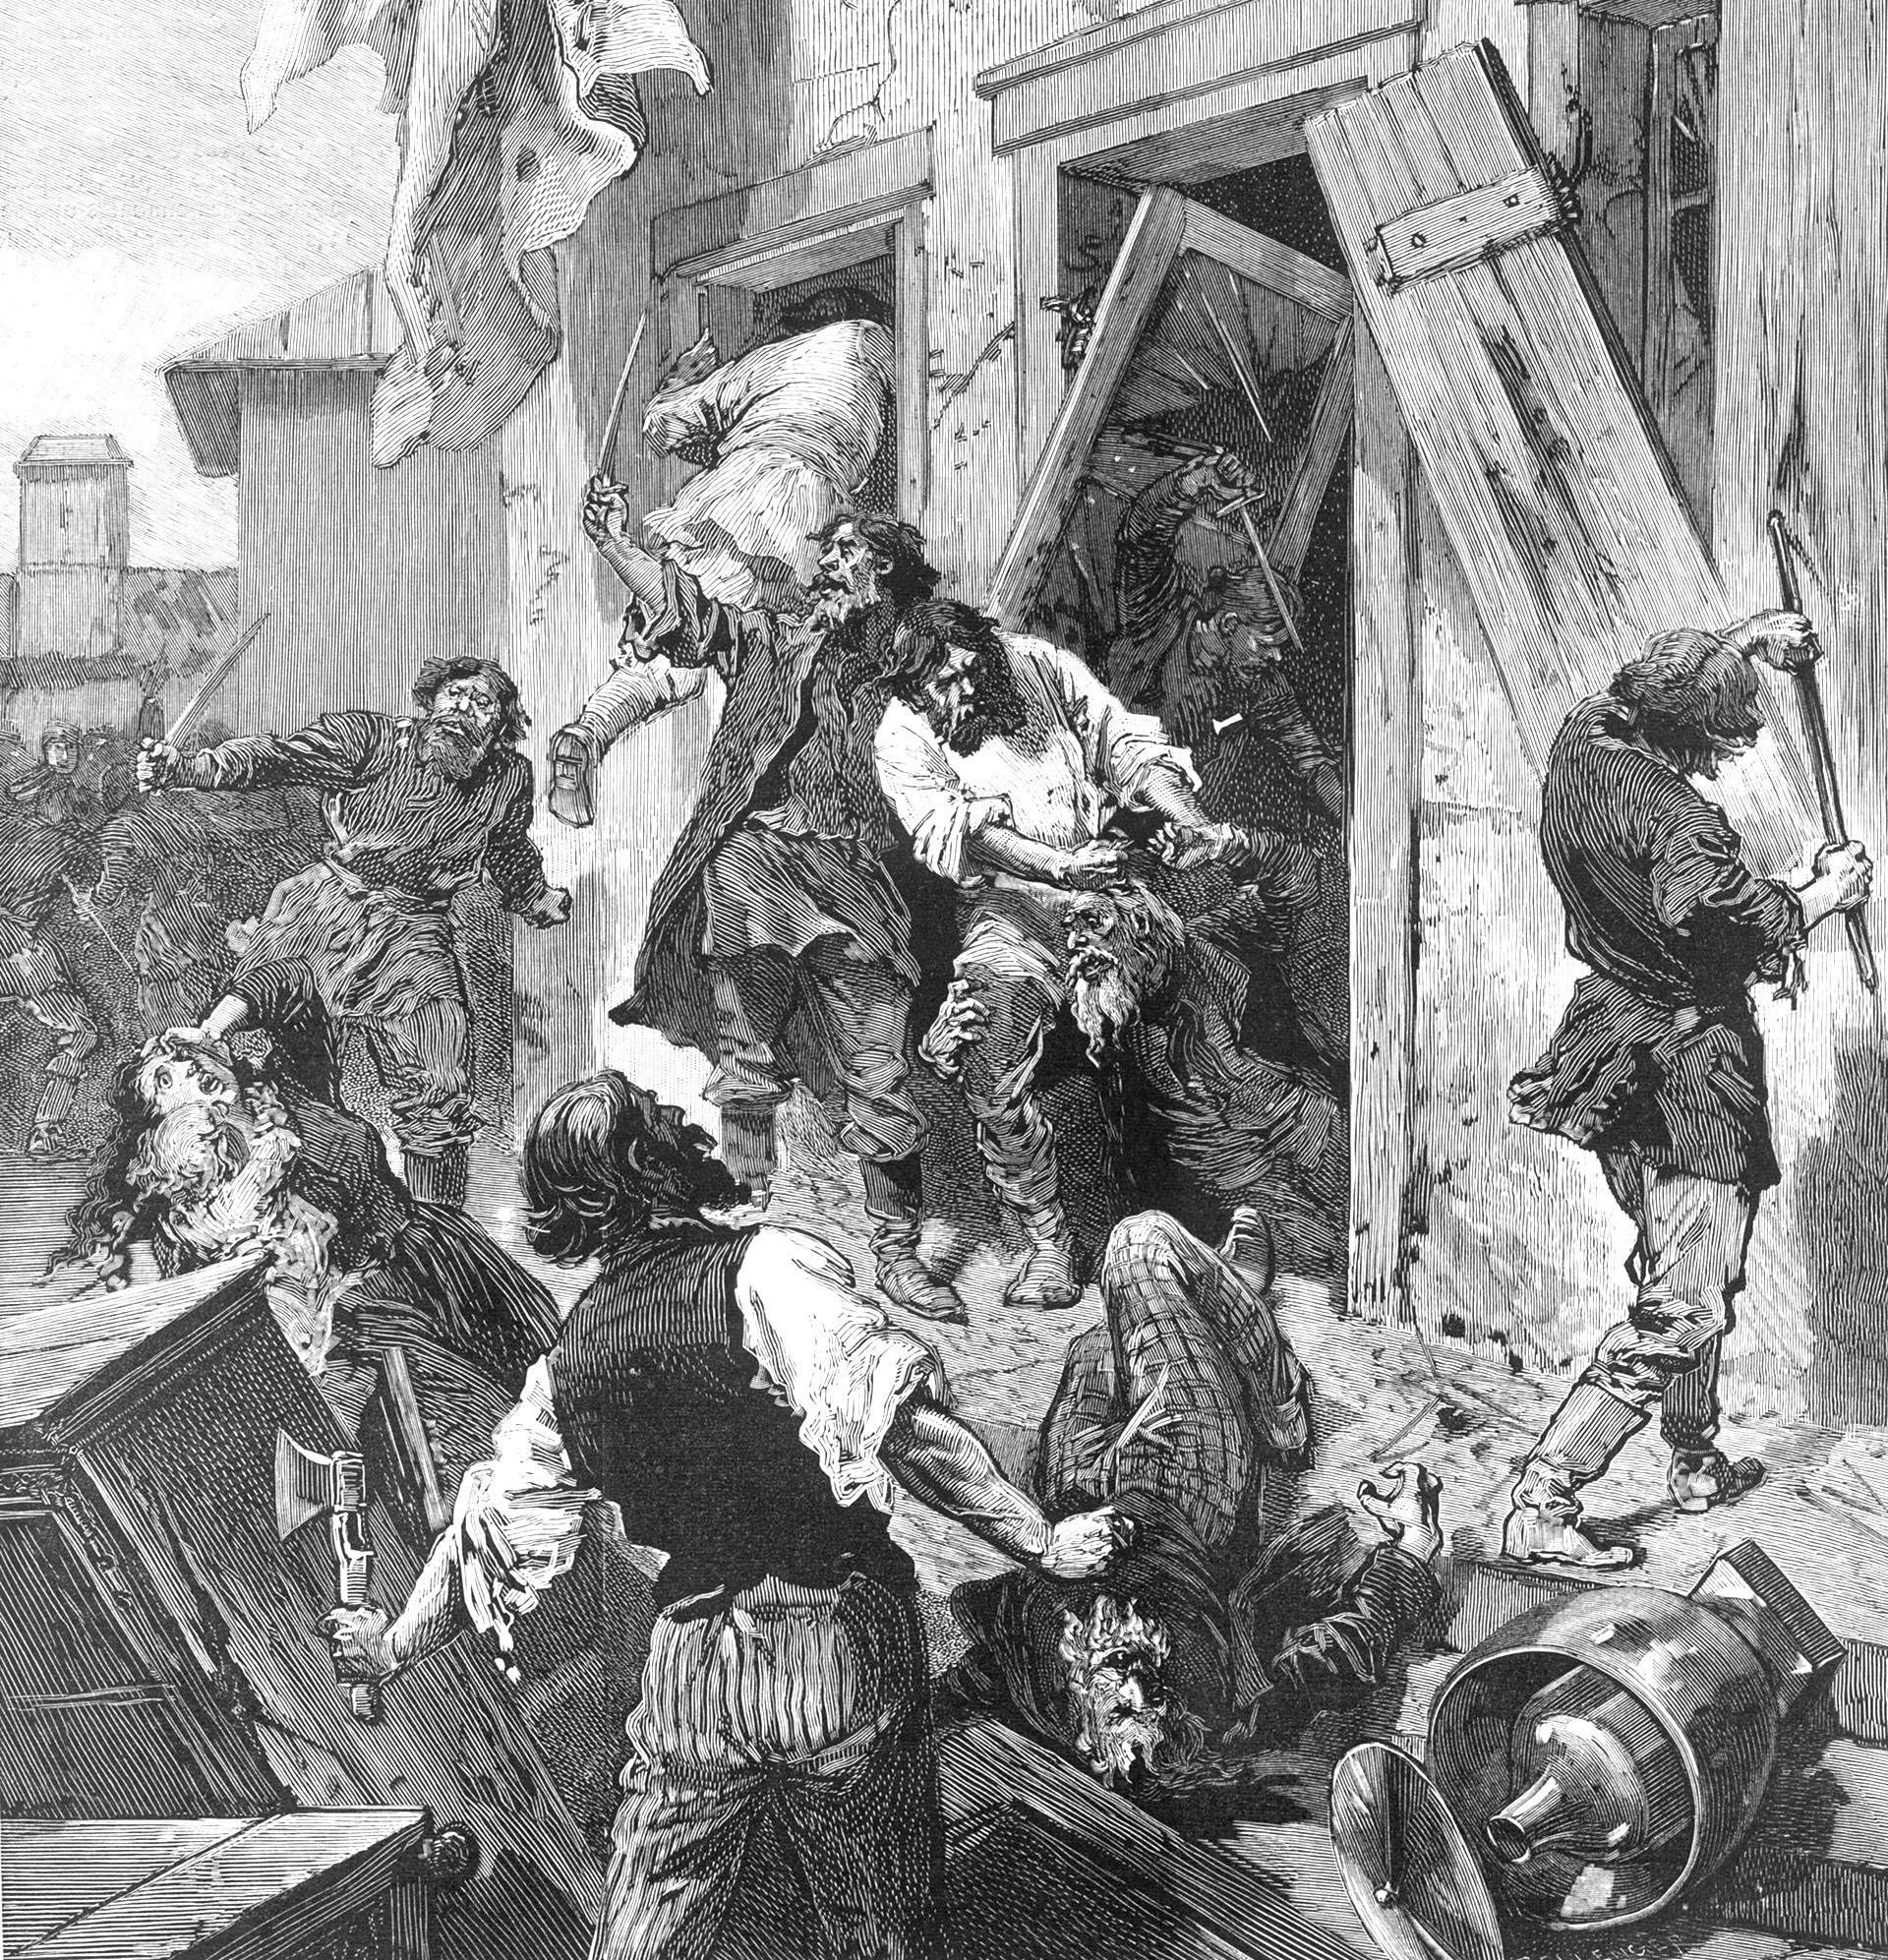 Napad na judovski dom pri Nižnem Novgorodu